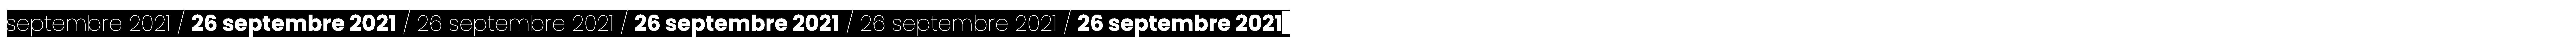 26-septembre-2021_TDP-scroll